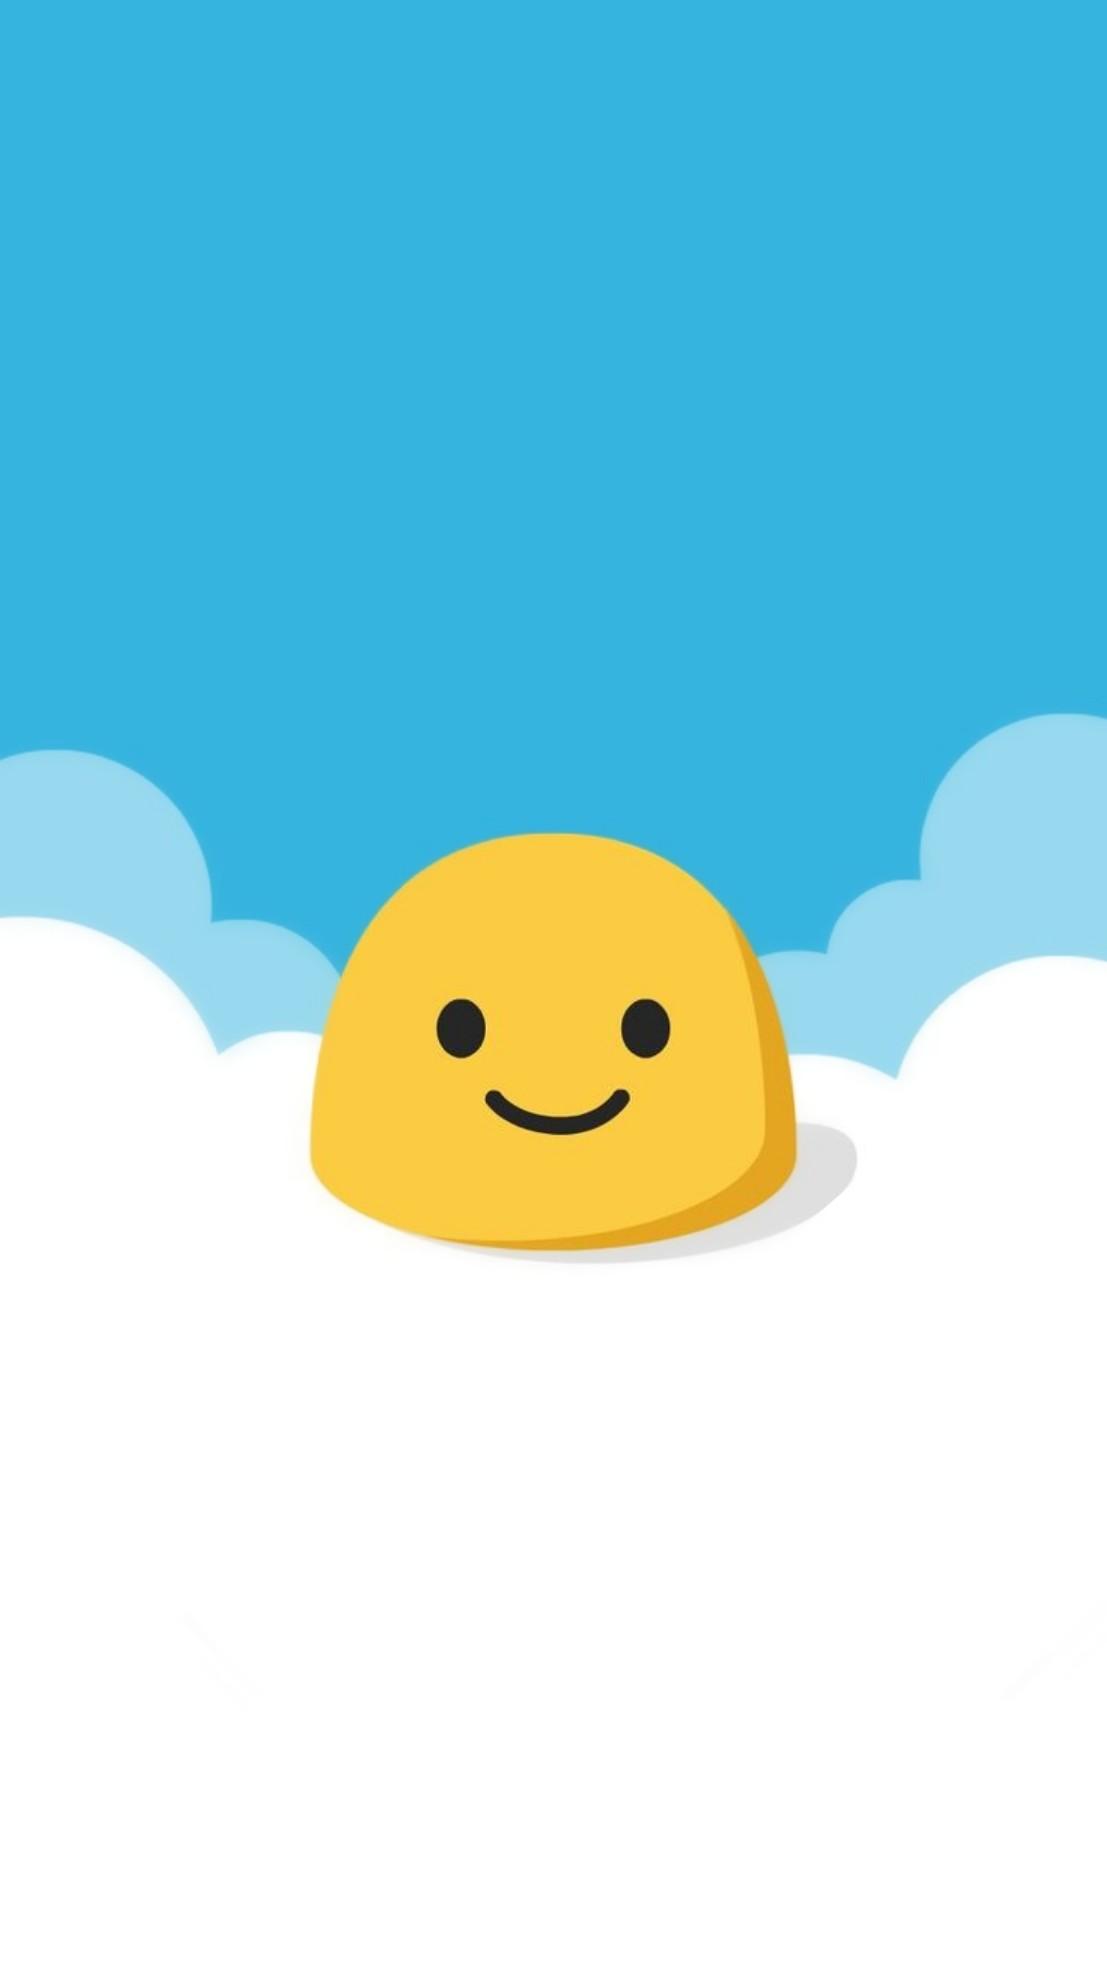 Emojis Wallpapers (61+ images)